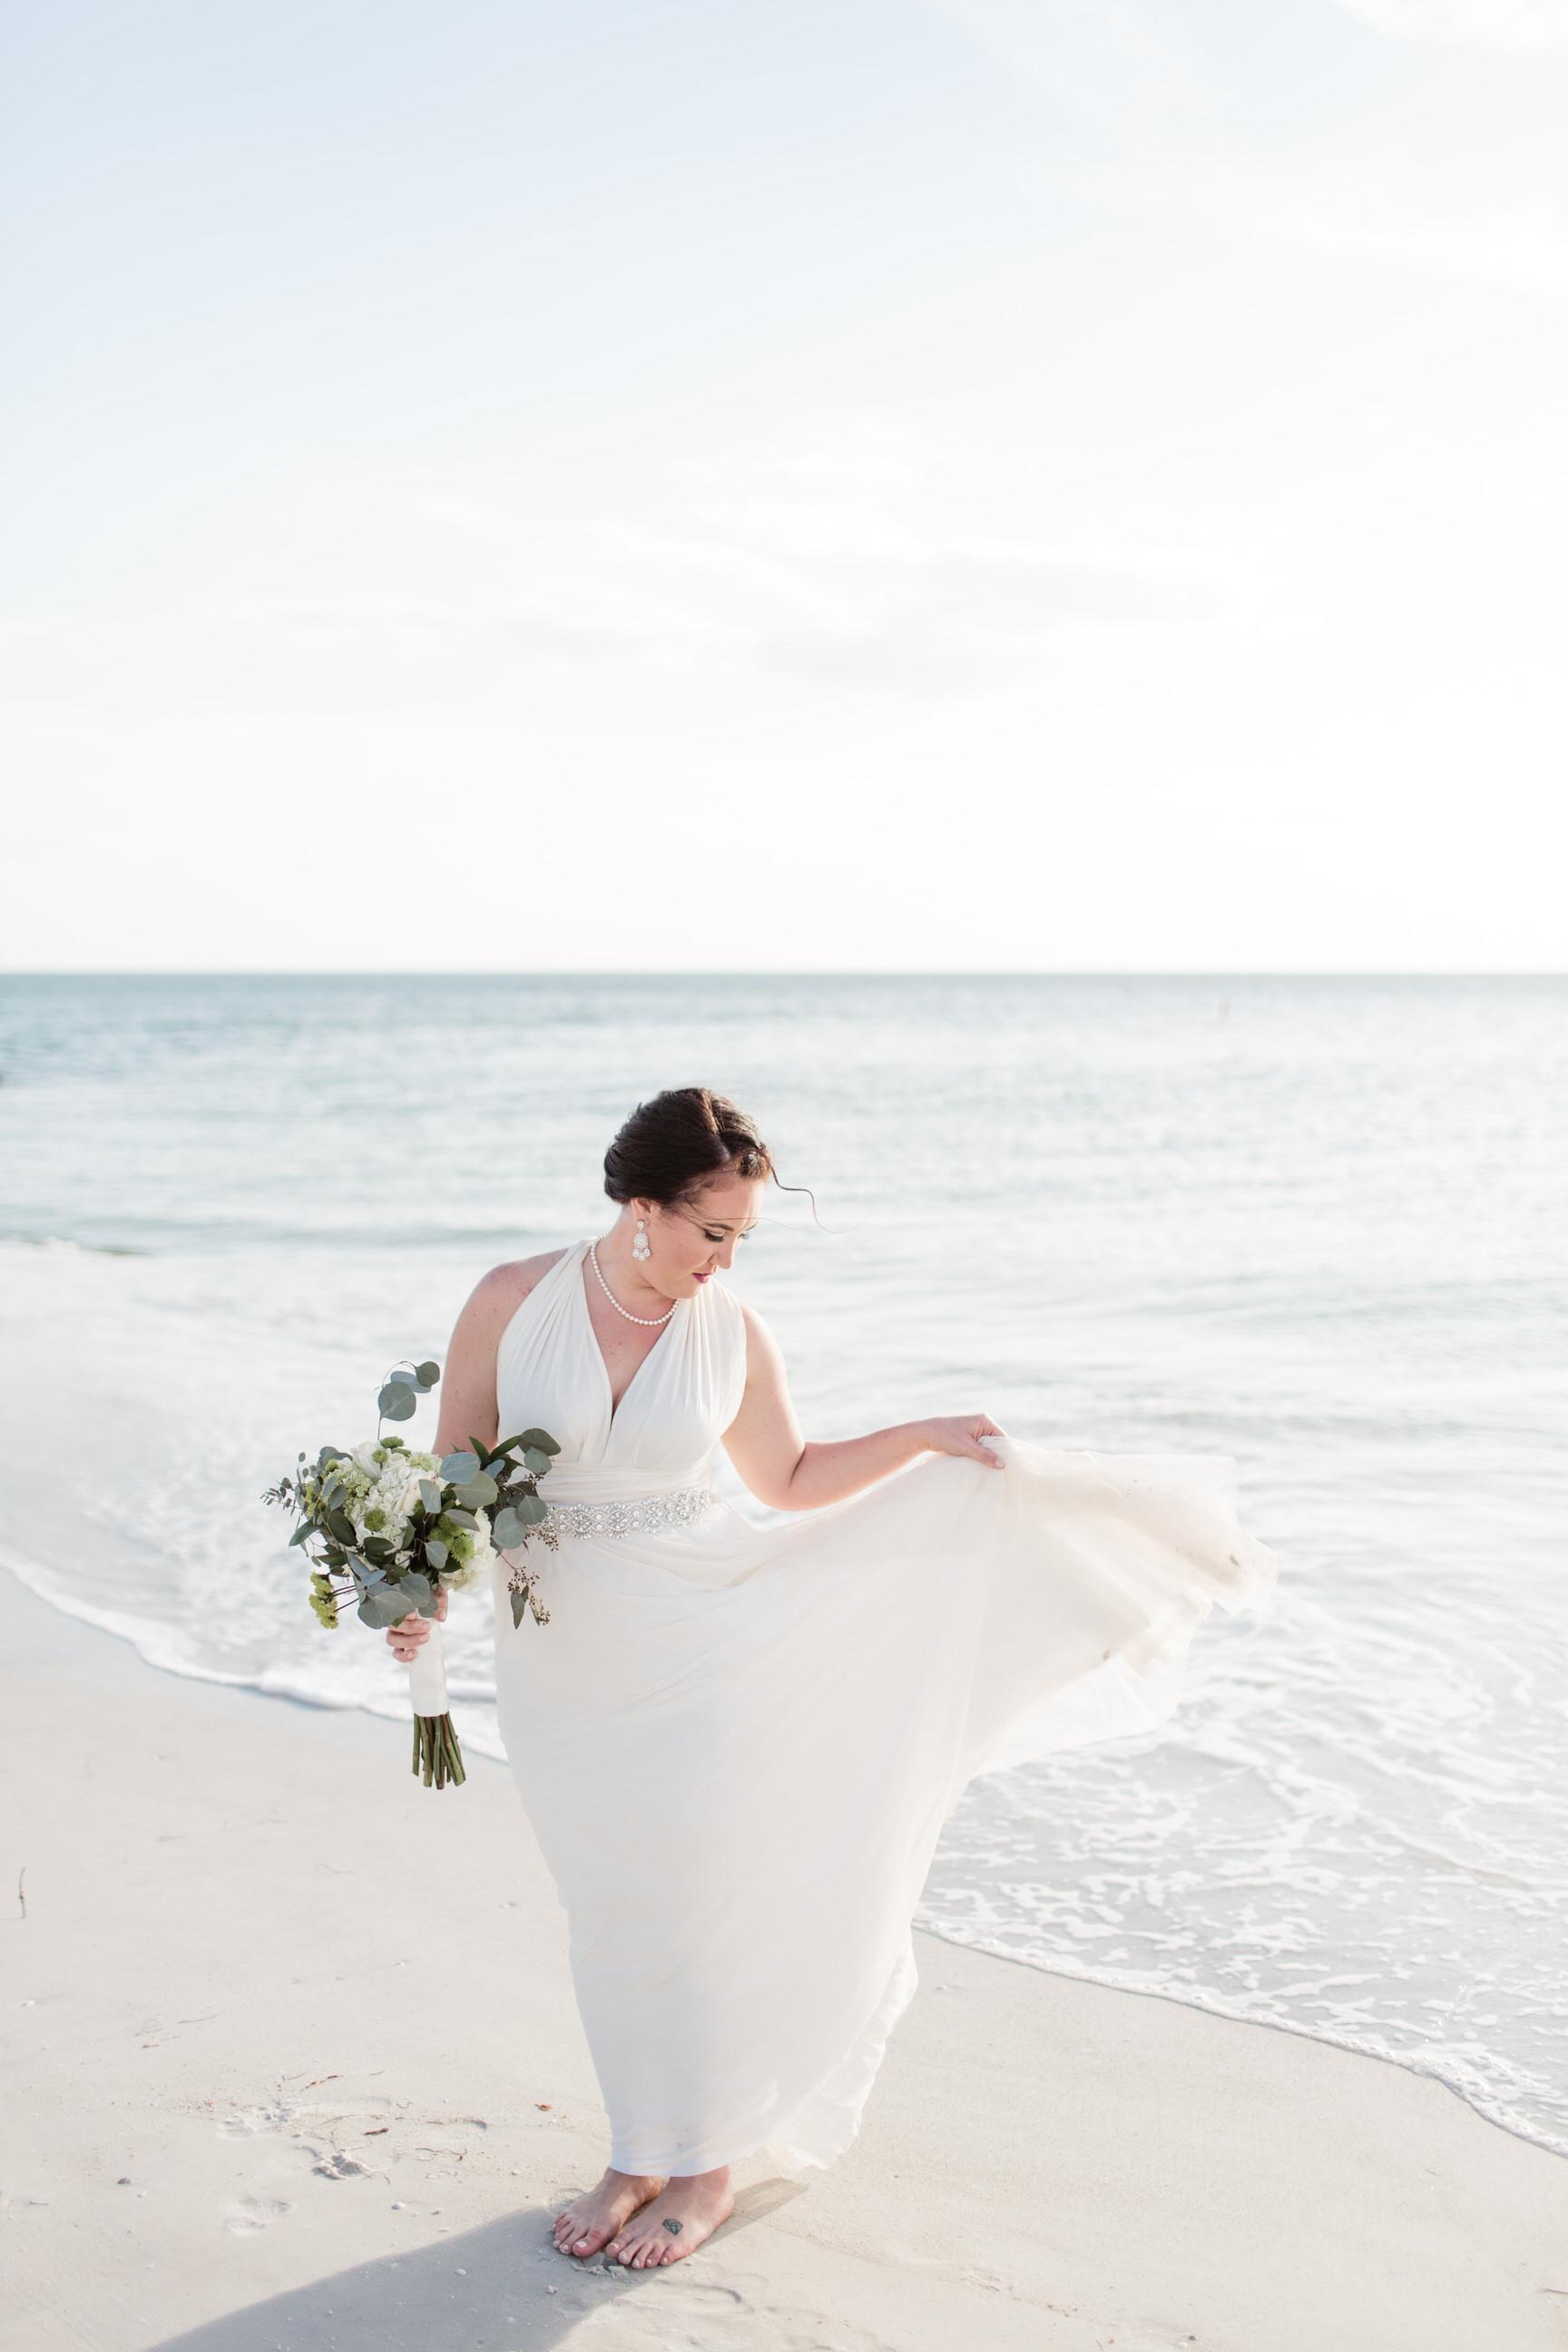 Beltran_Treasure_Island_Elopement_Tampa_Wedding_077-1.jpg